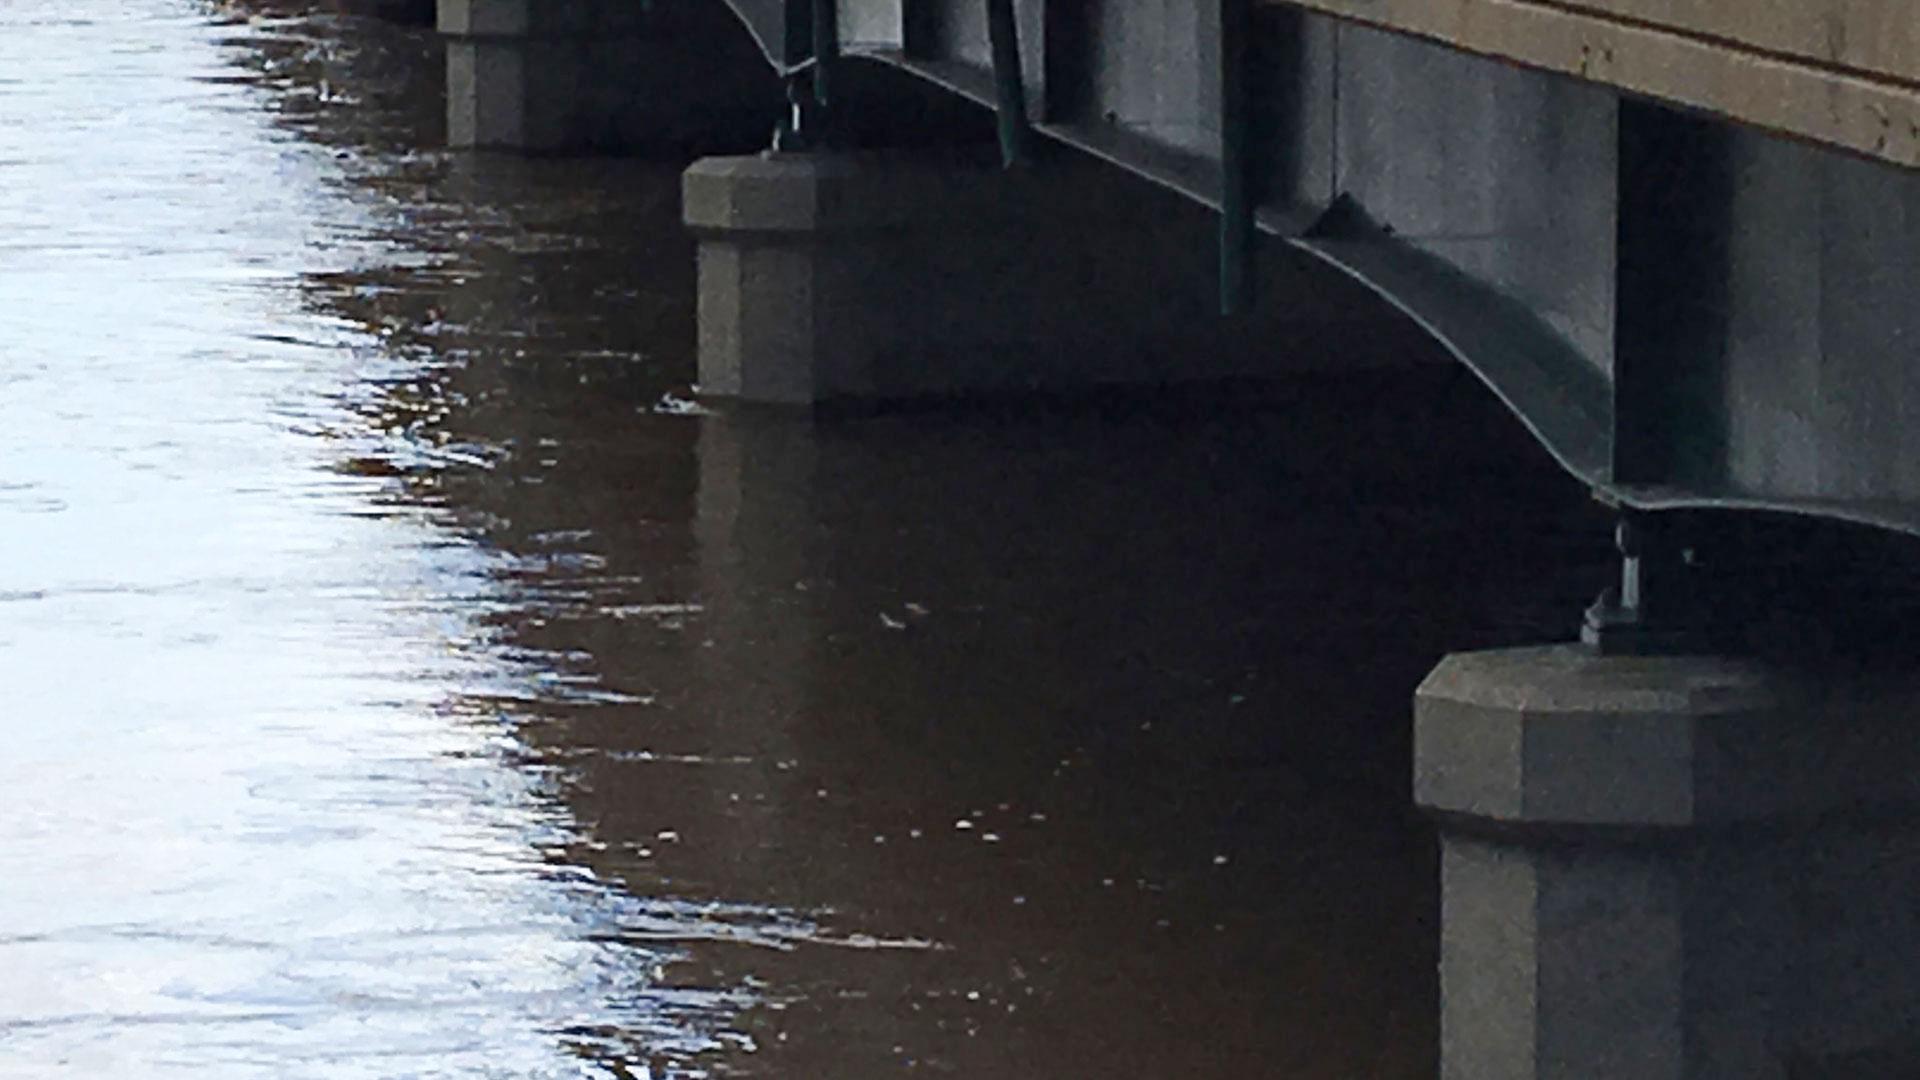 KELO water levels highway 11 splitrock bridge